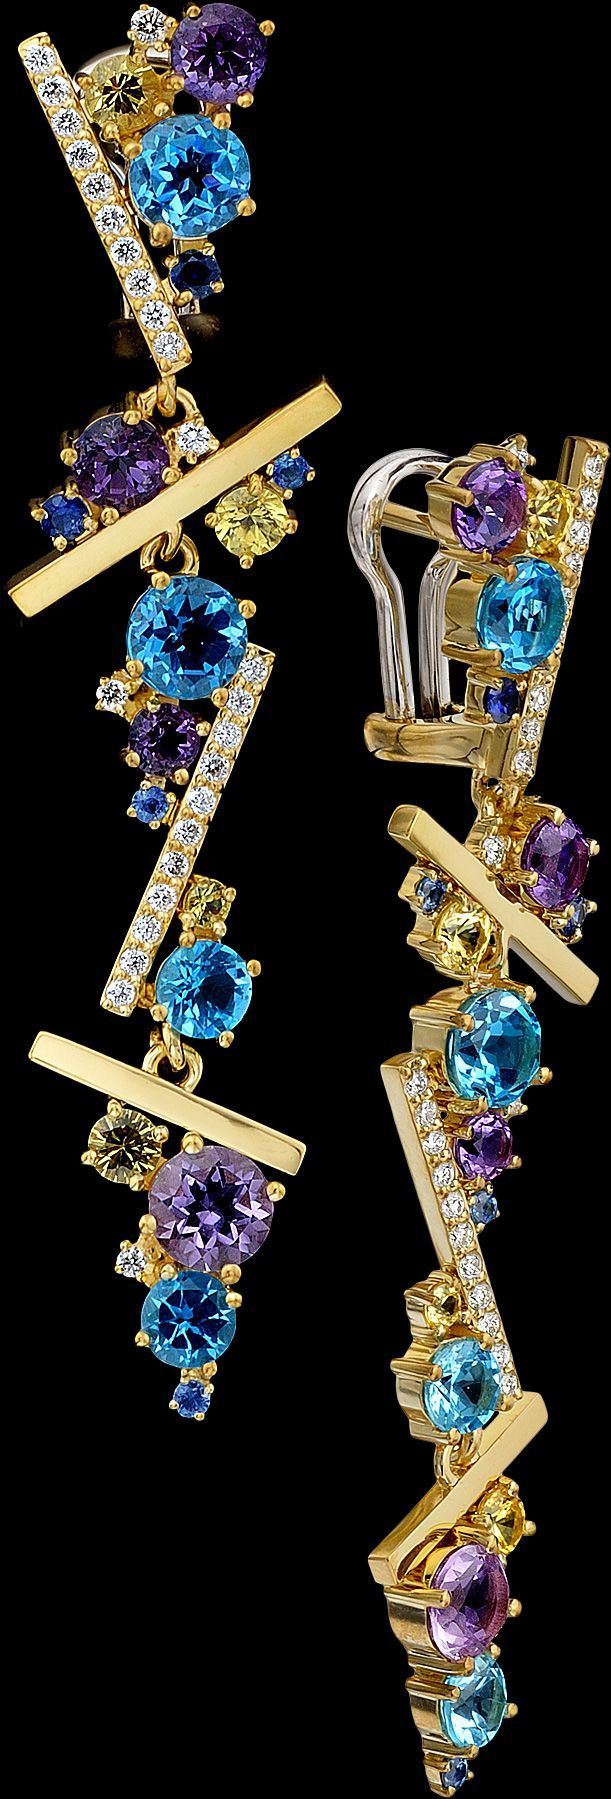 18K Diamond, Sapphir beauty bling jewelry fashion